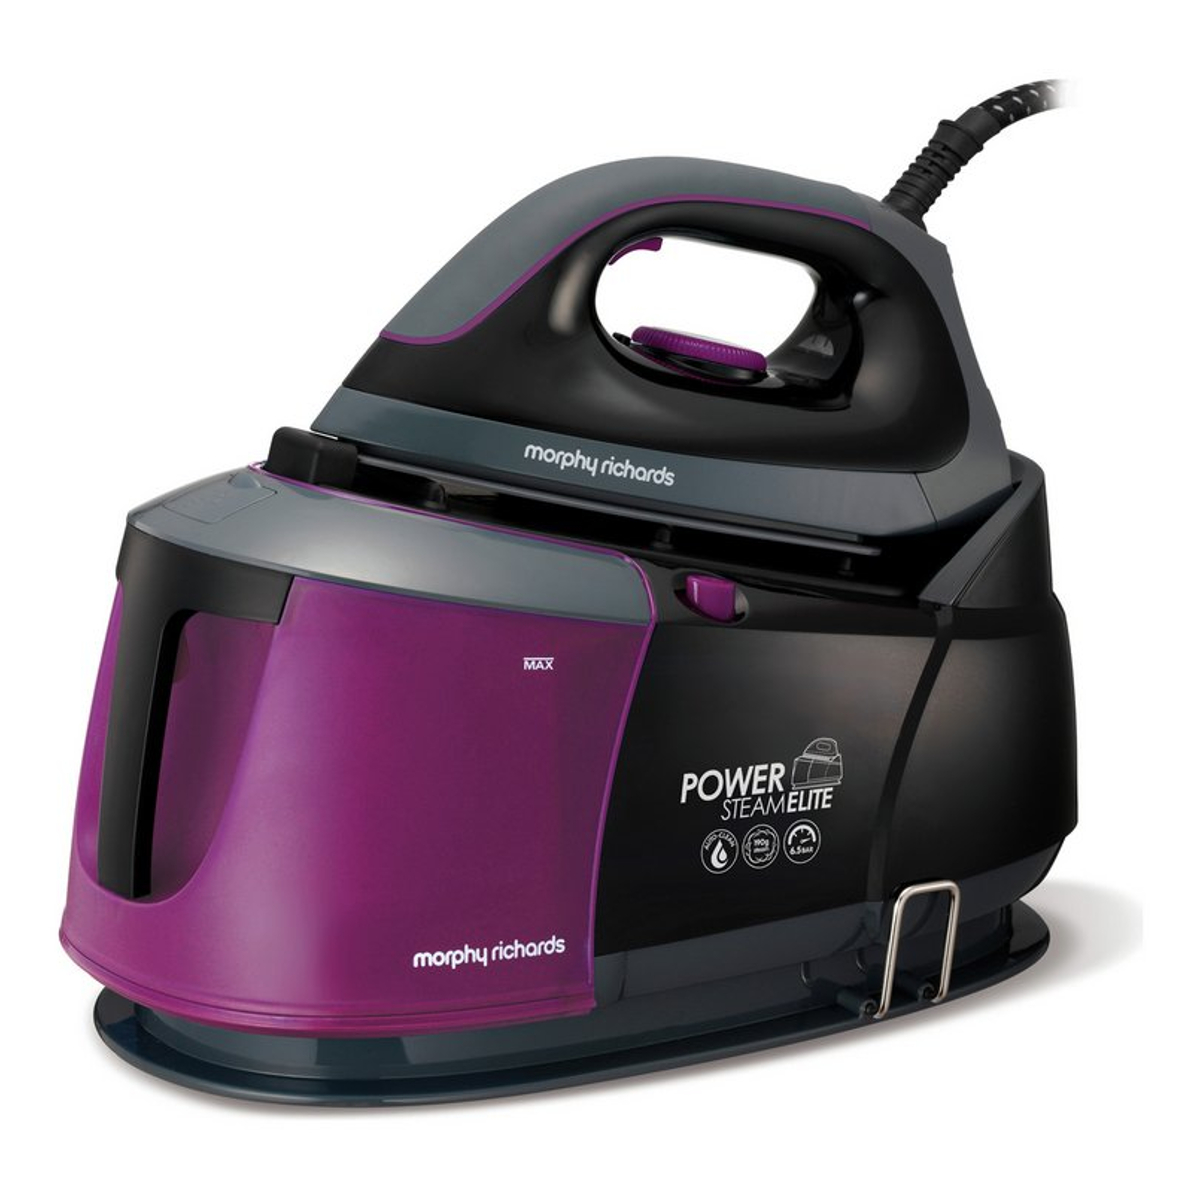 morphy richards 332012 power steam generator iron black. Black Bedroom Furniture Sets. Home Design Ideas